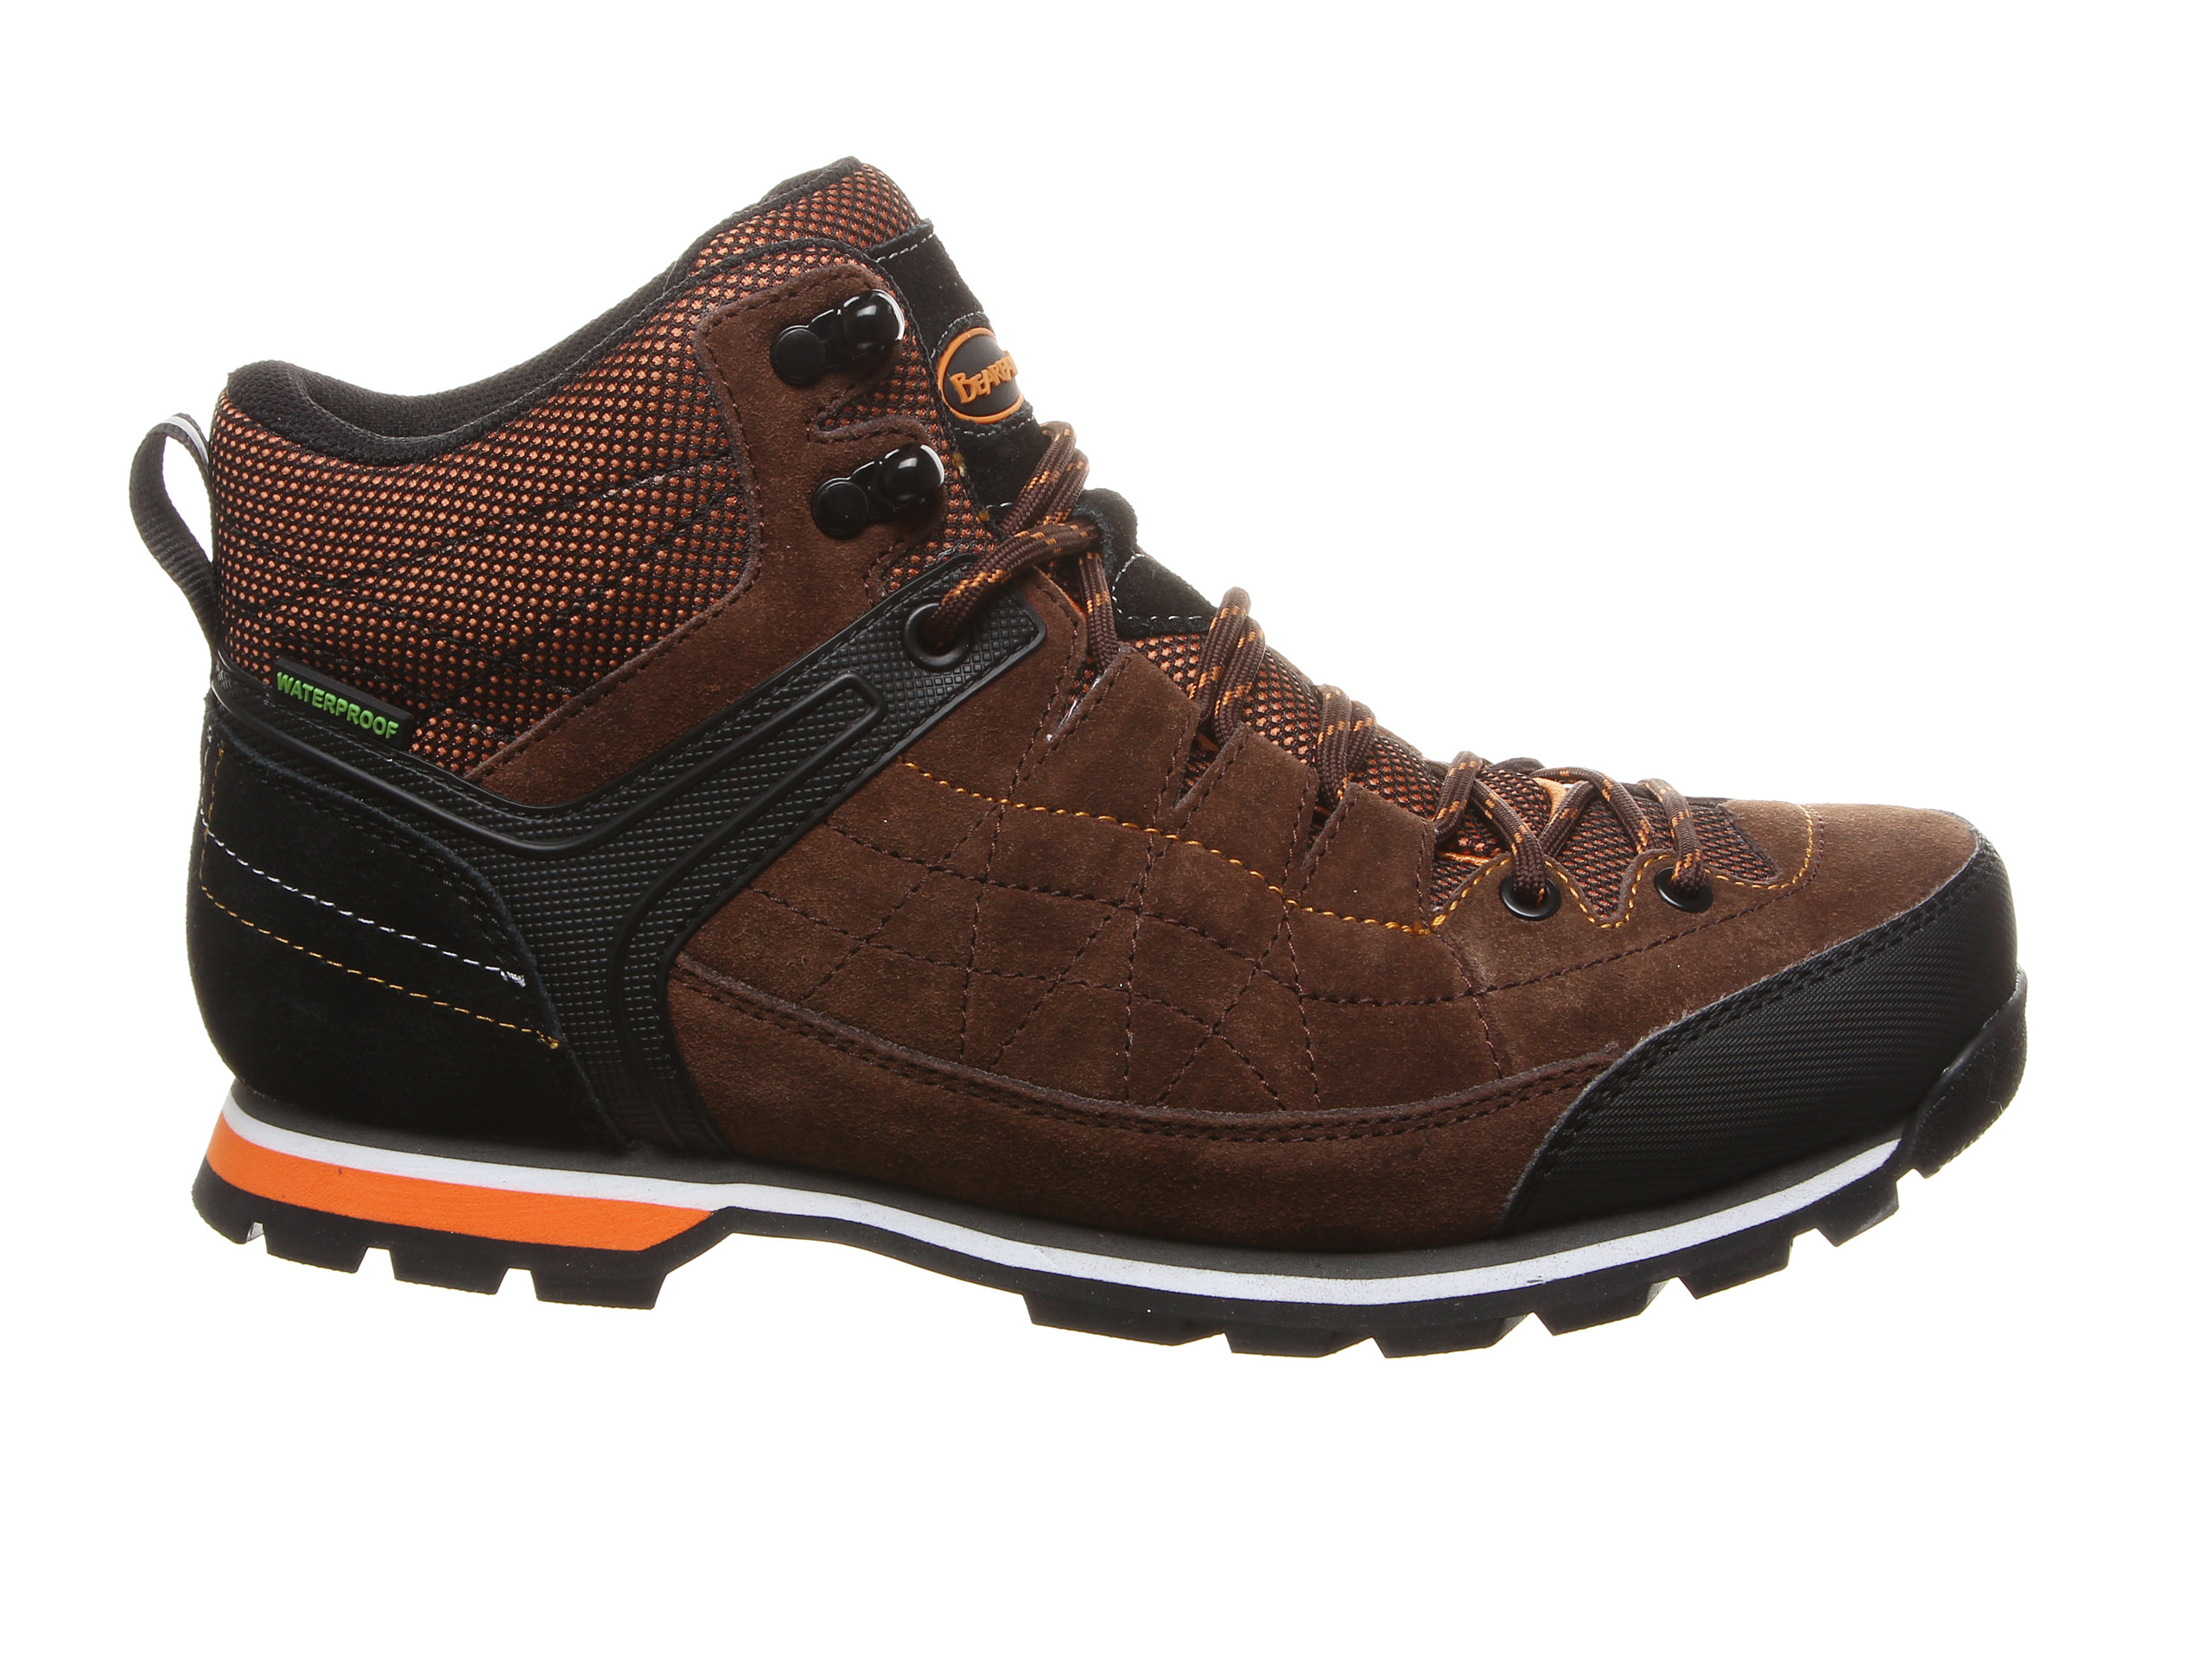 Bearpaw Yosemite Men's Boots (Brown)